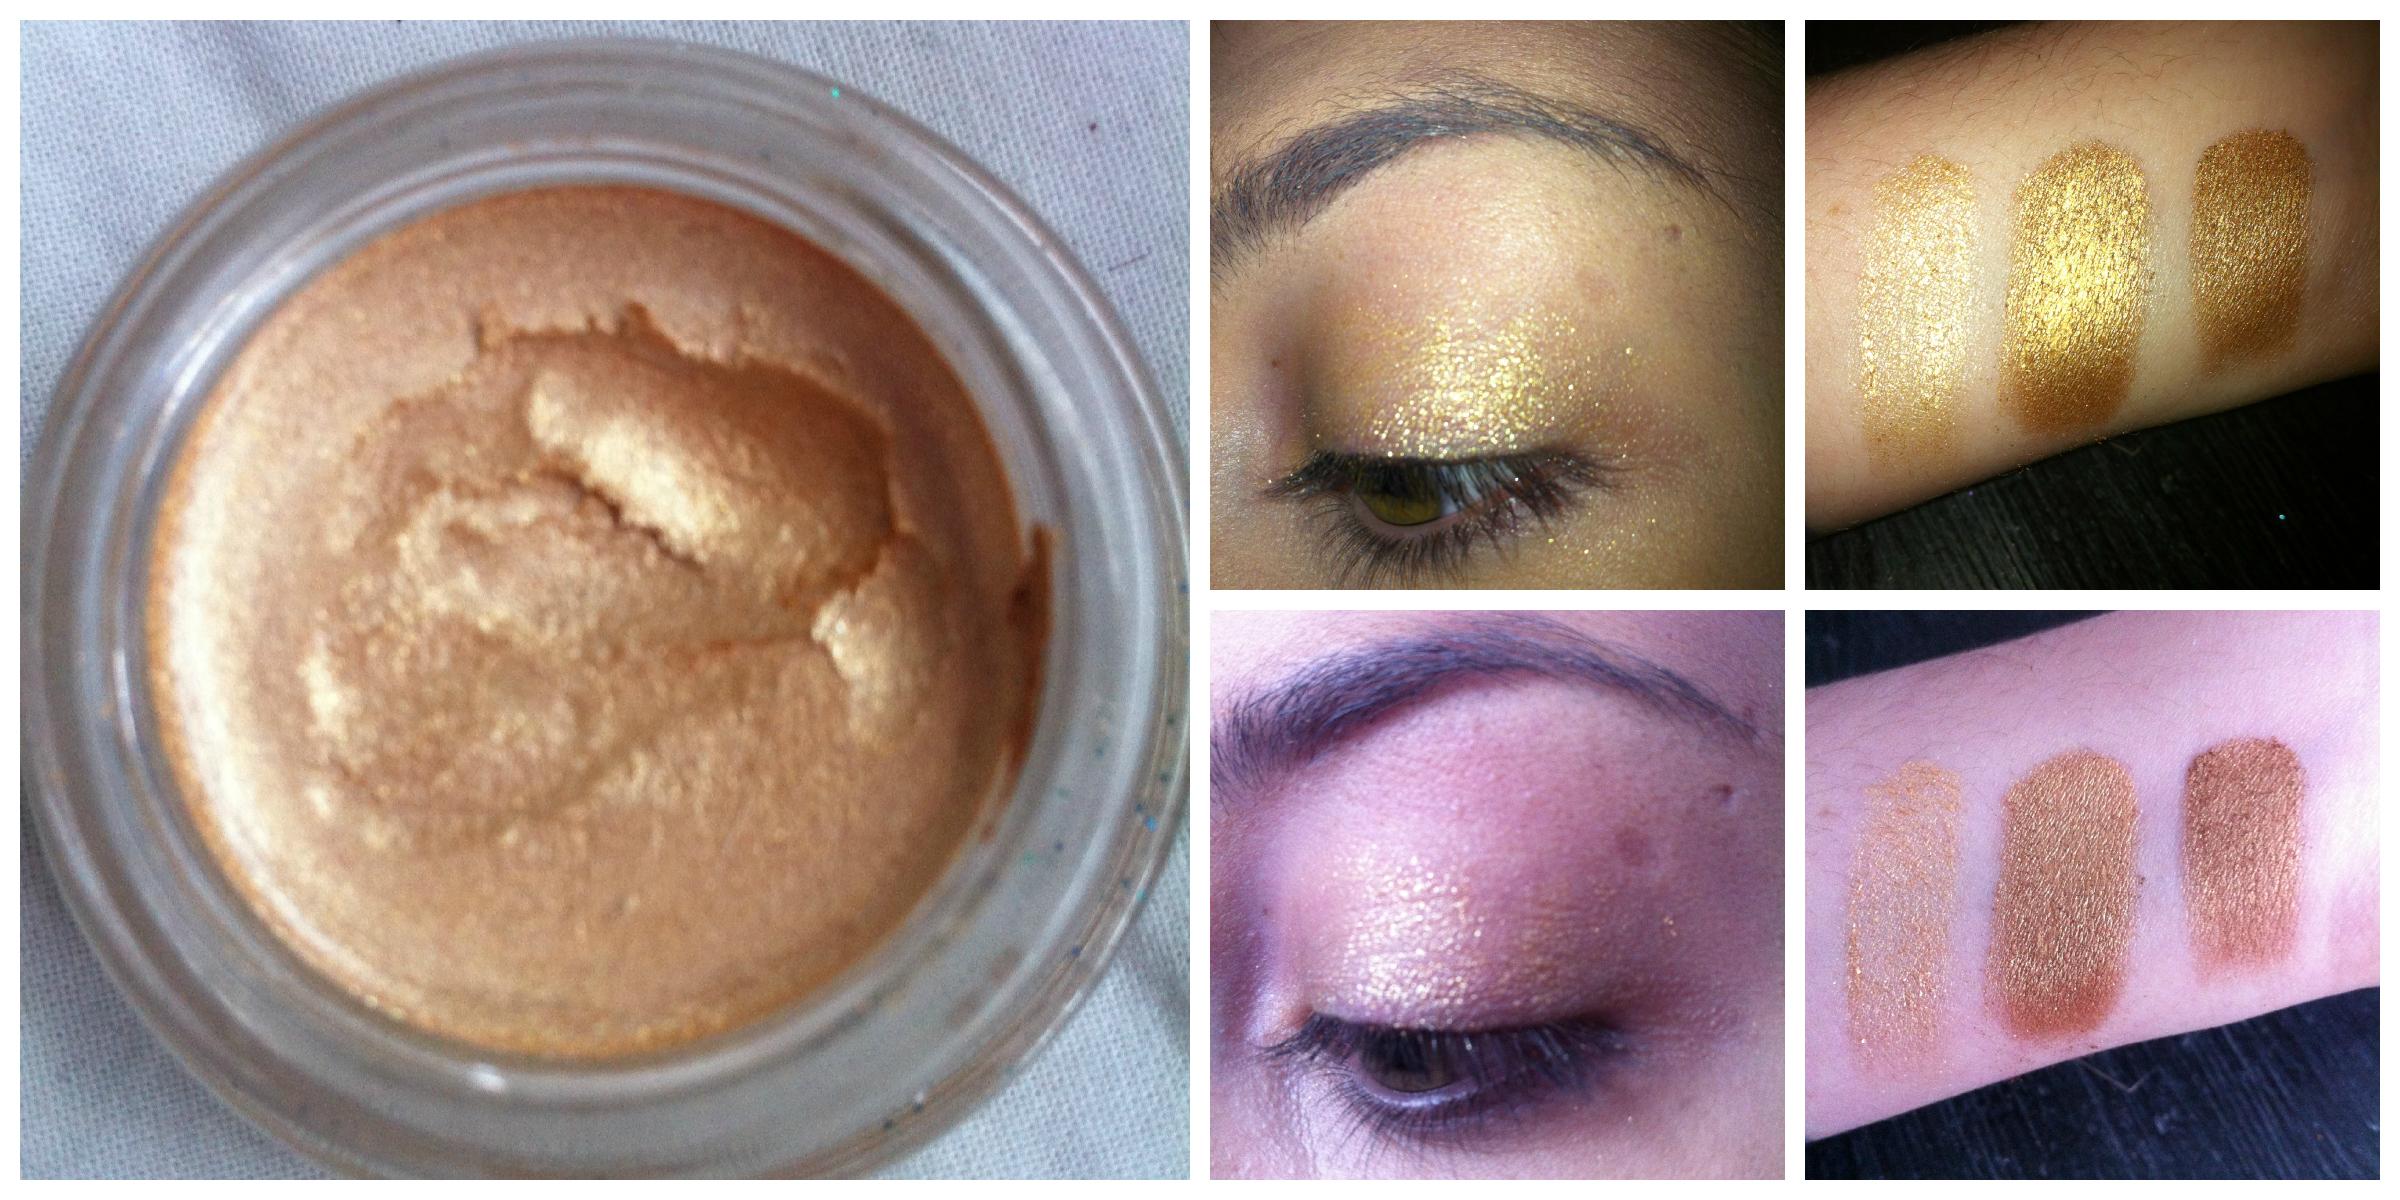 Maybelline Eye Studio Colour